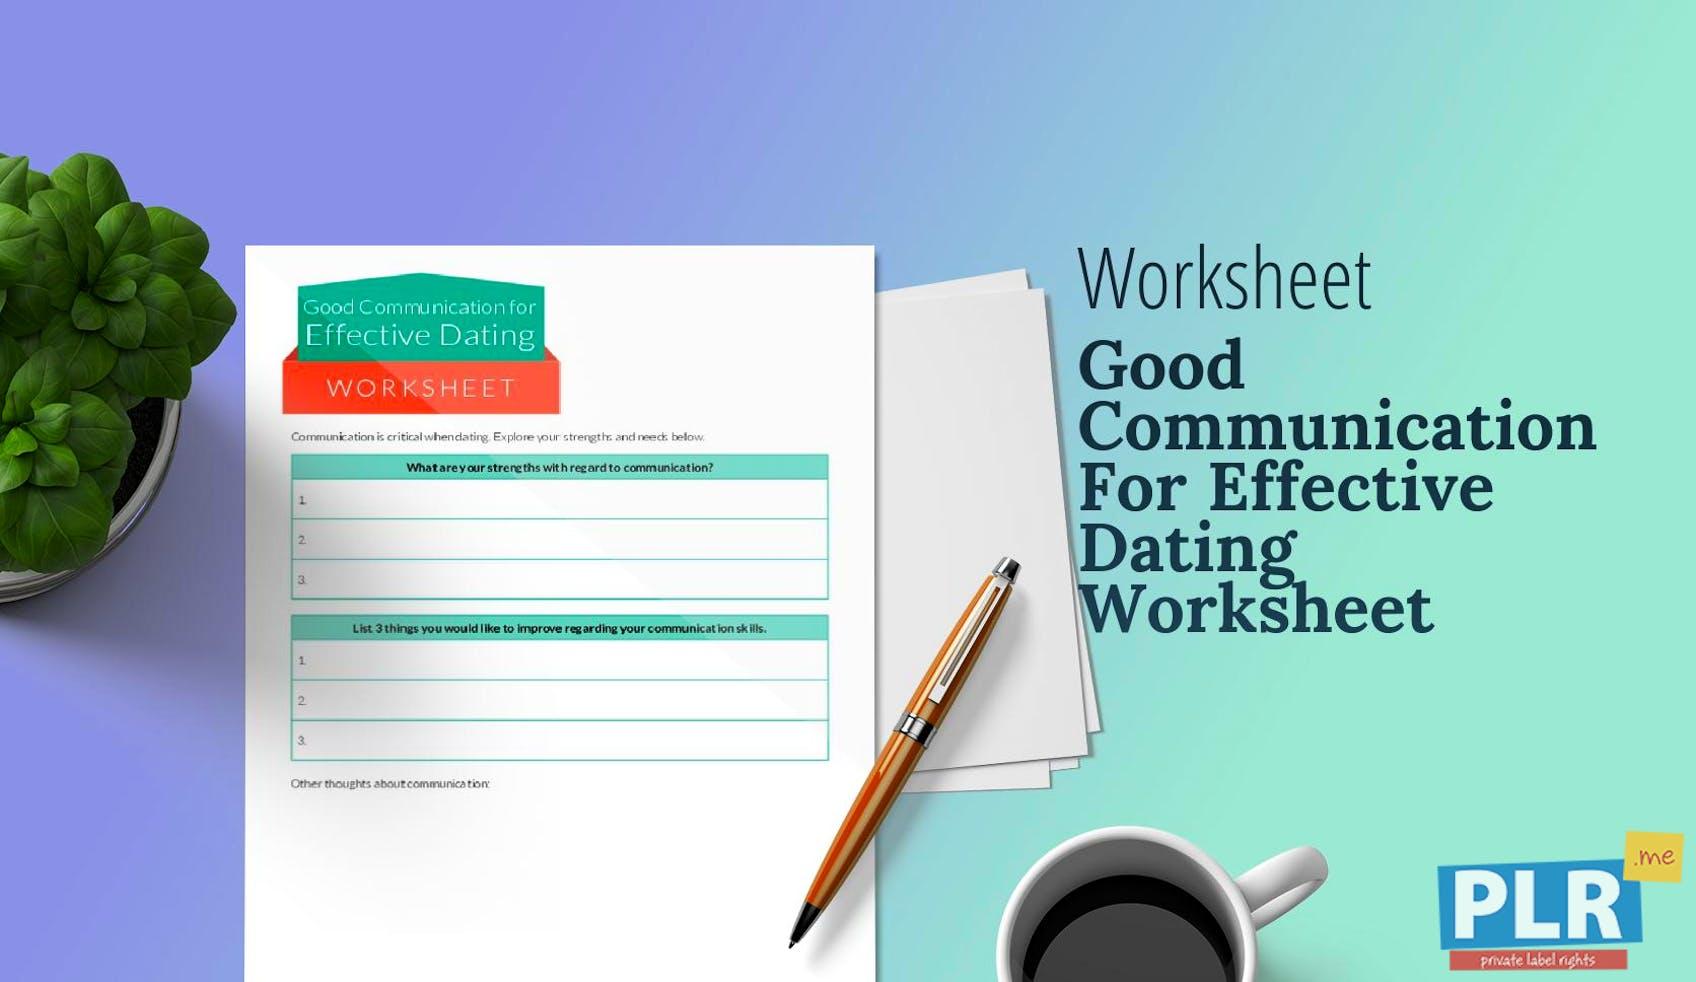 Good Communication For Effective Dating Worksheet